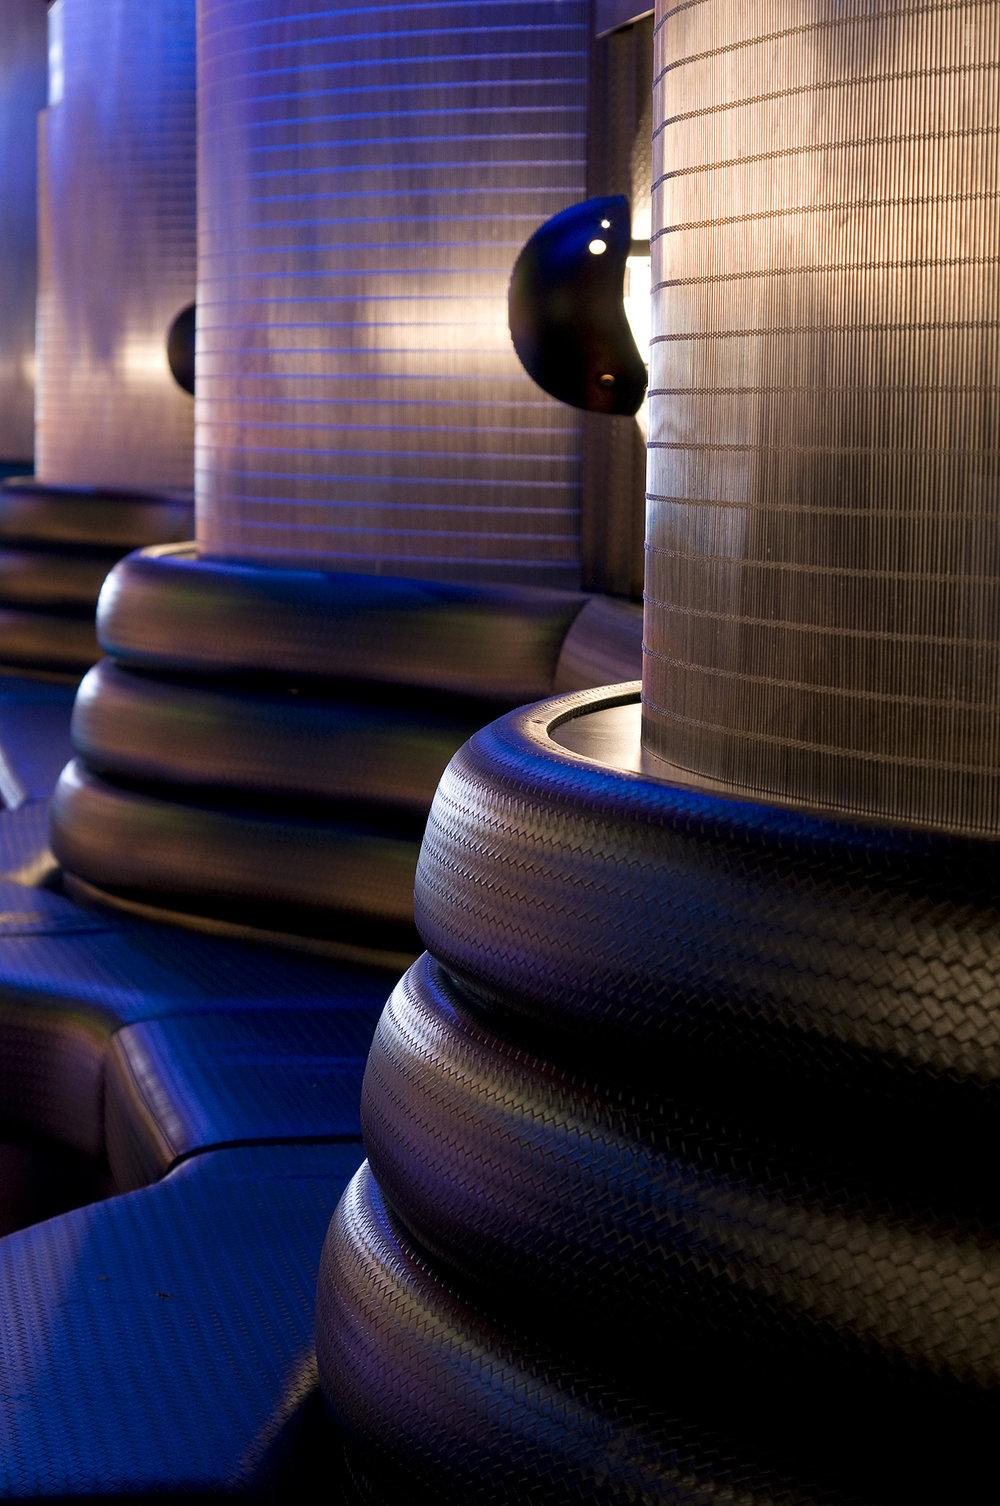 studio-saint-bars-and-restaurants-tattoo-bar-washington-dc-6